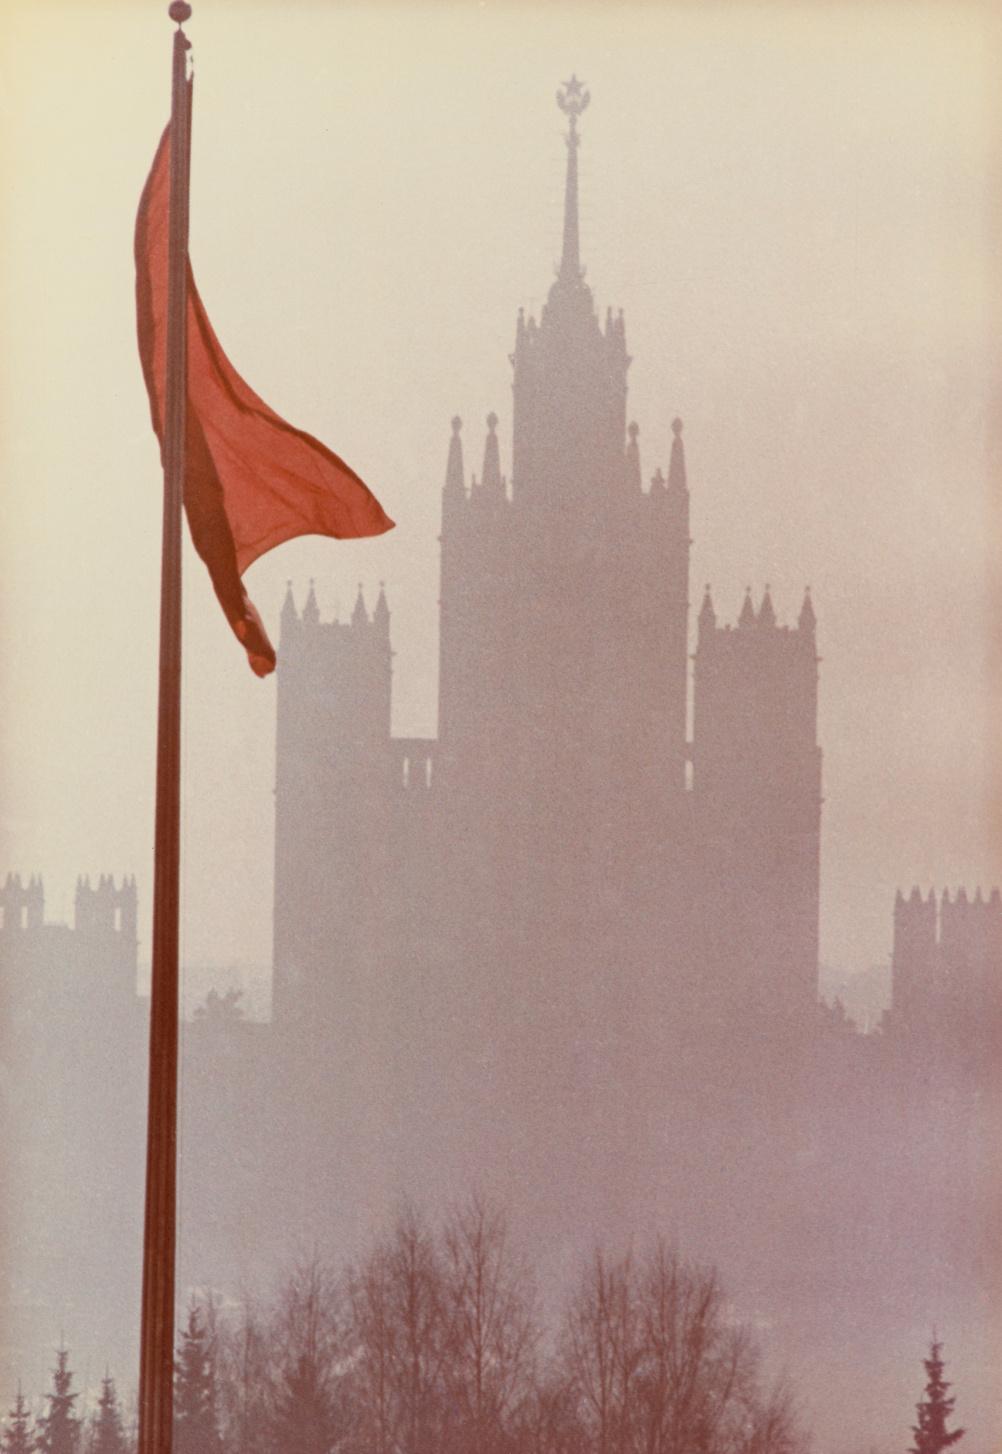 Dmitri Baltermants Untitled (Flag), 1960s